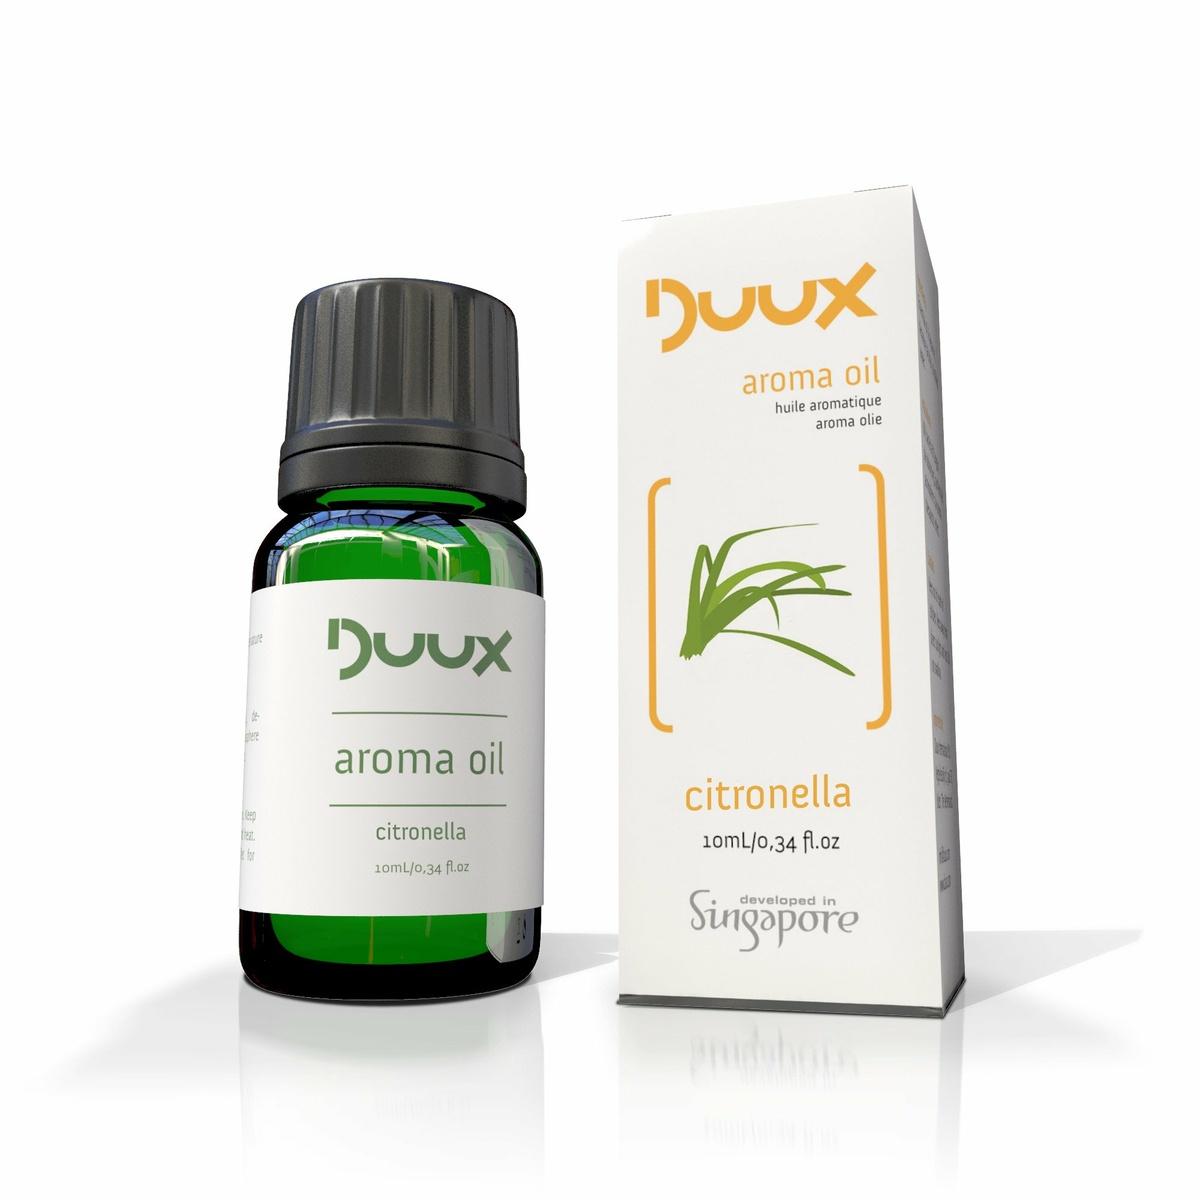 MAXX Duux aróma olej Citronella - pre čističku,